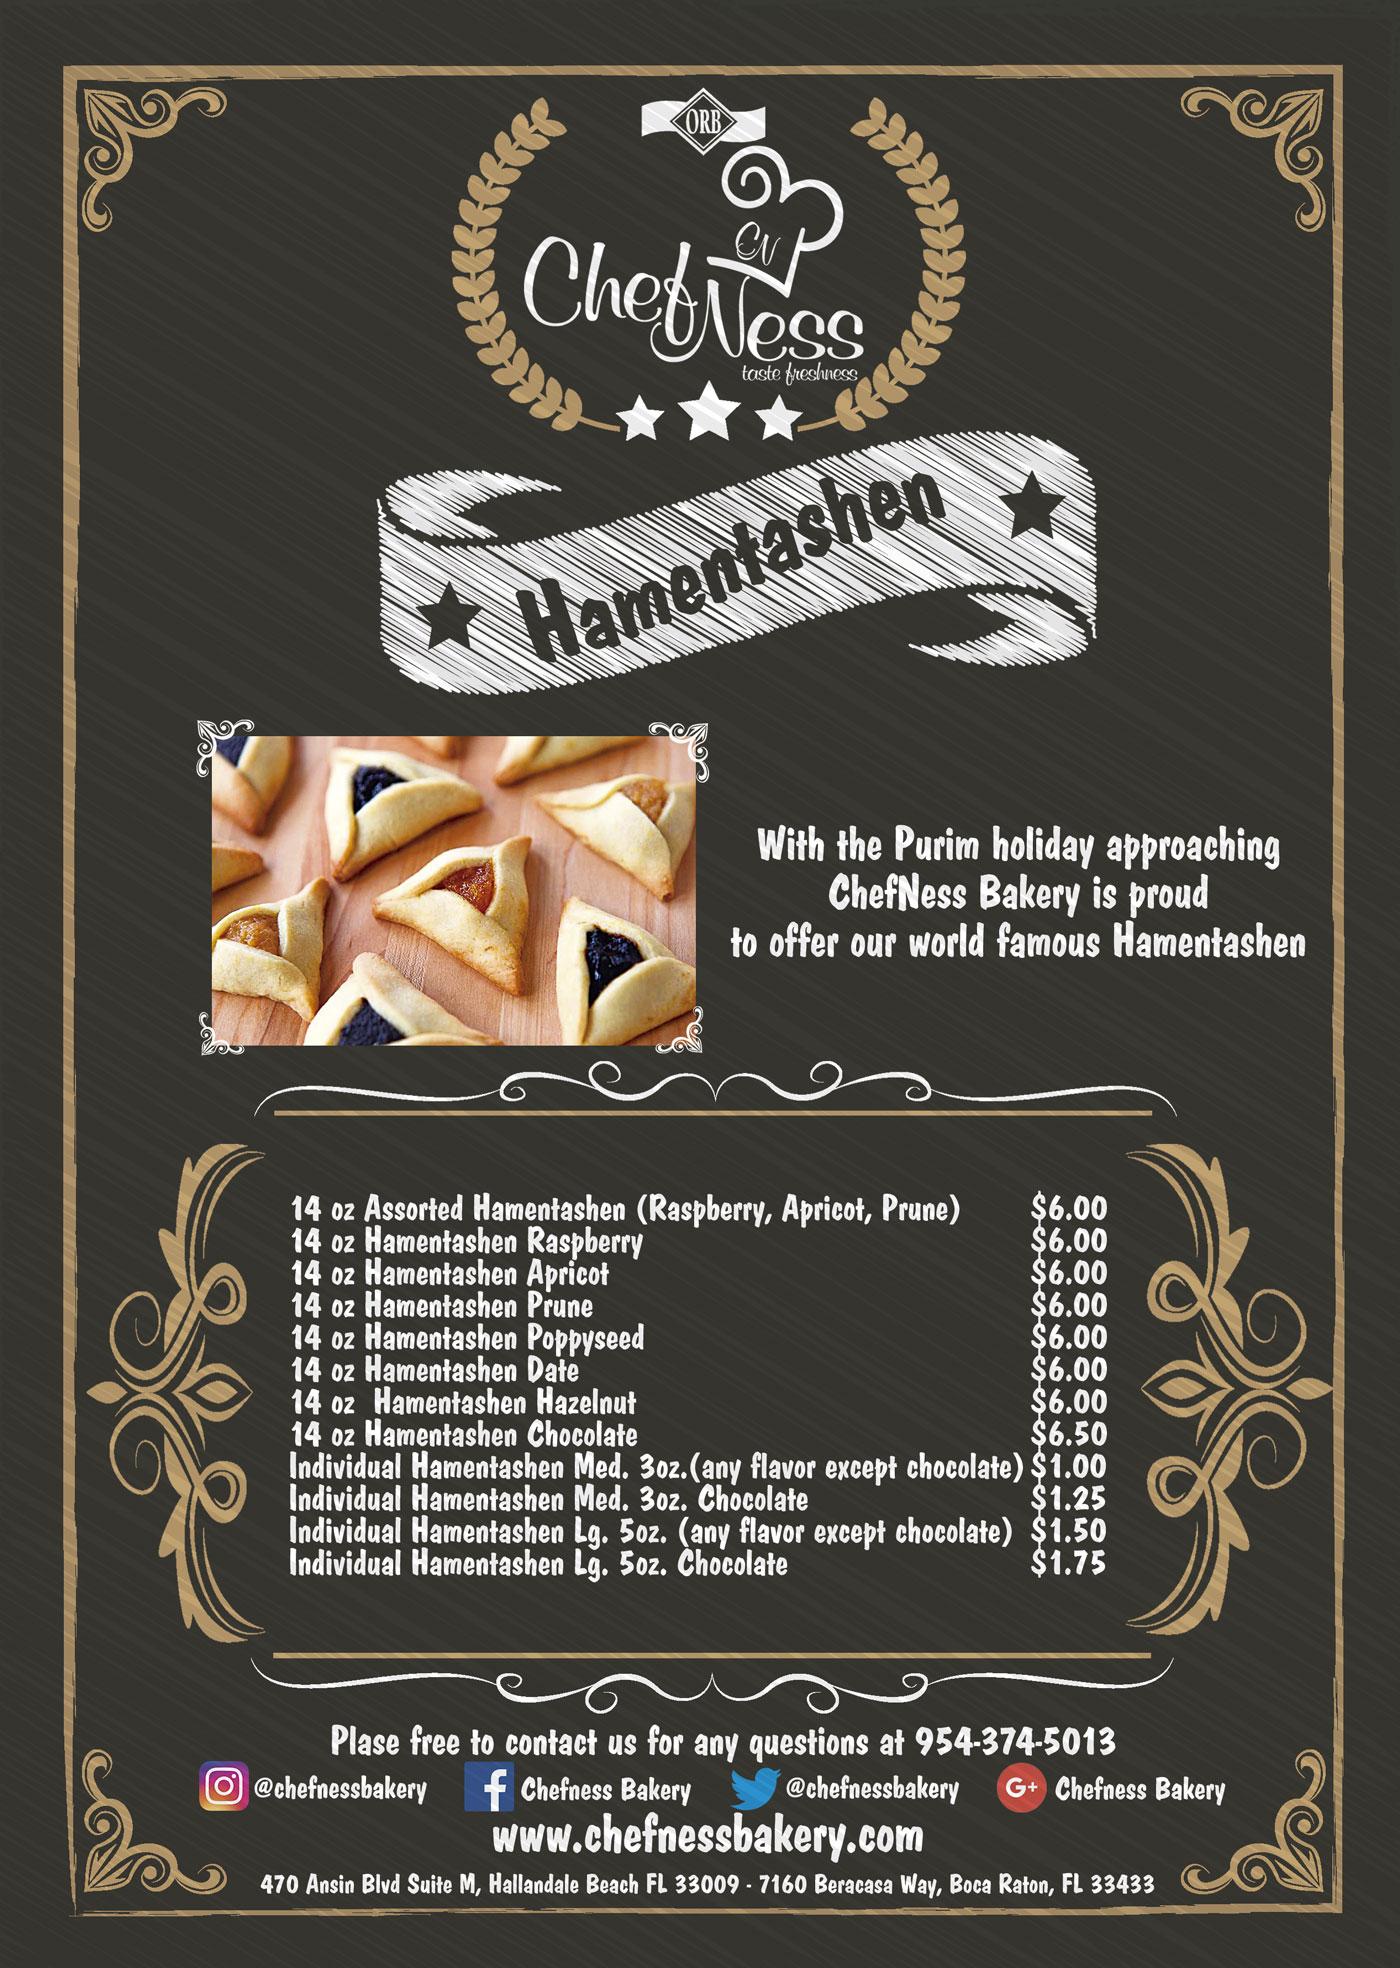 hamantaschen-purim-catalog-chefness-bakery